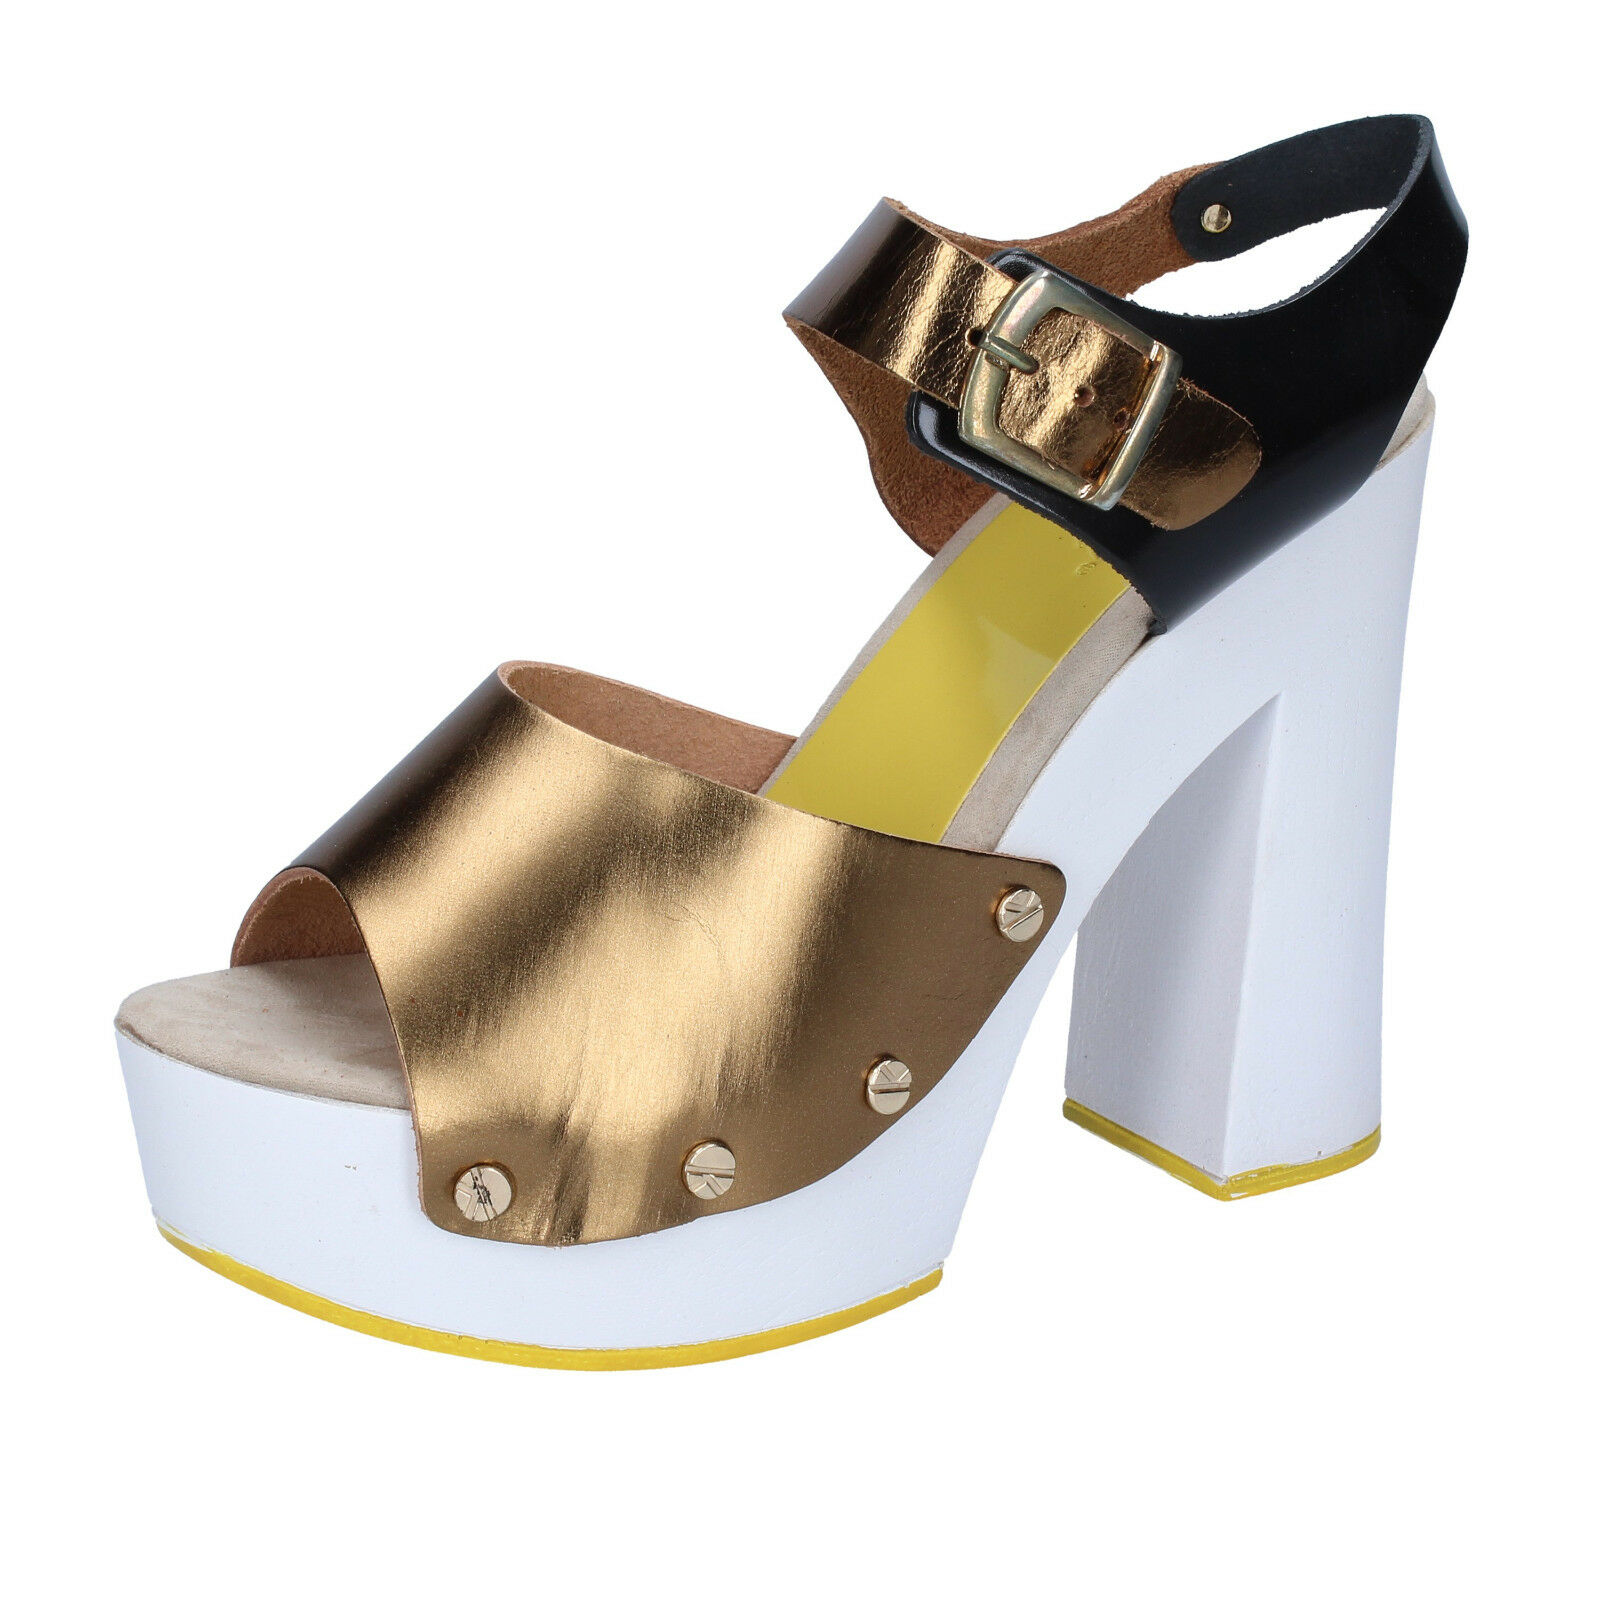 Para mujeres Zapatos Suky marca 5 (EU (EU (EU 35) Sandalias Bronce Cuero Negro BS19-35  Venta barata